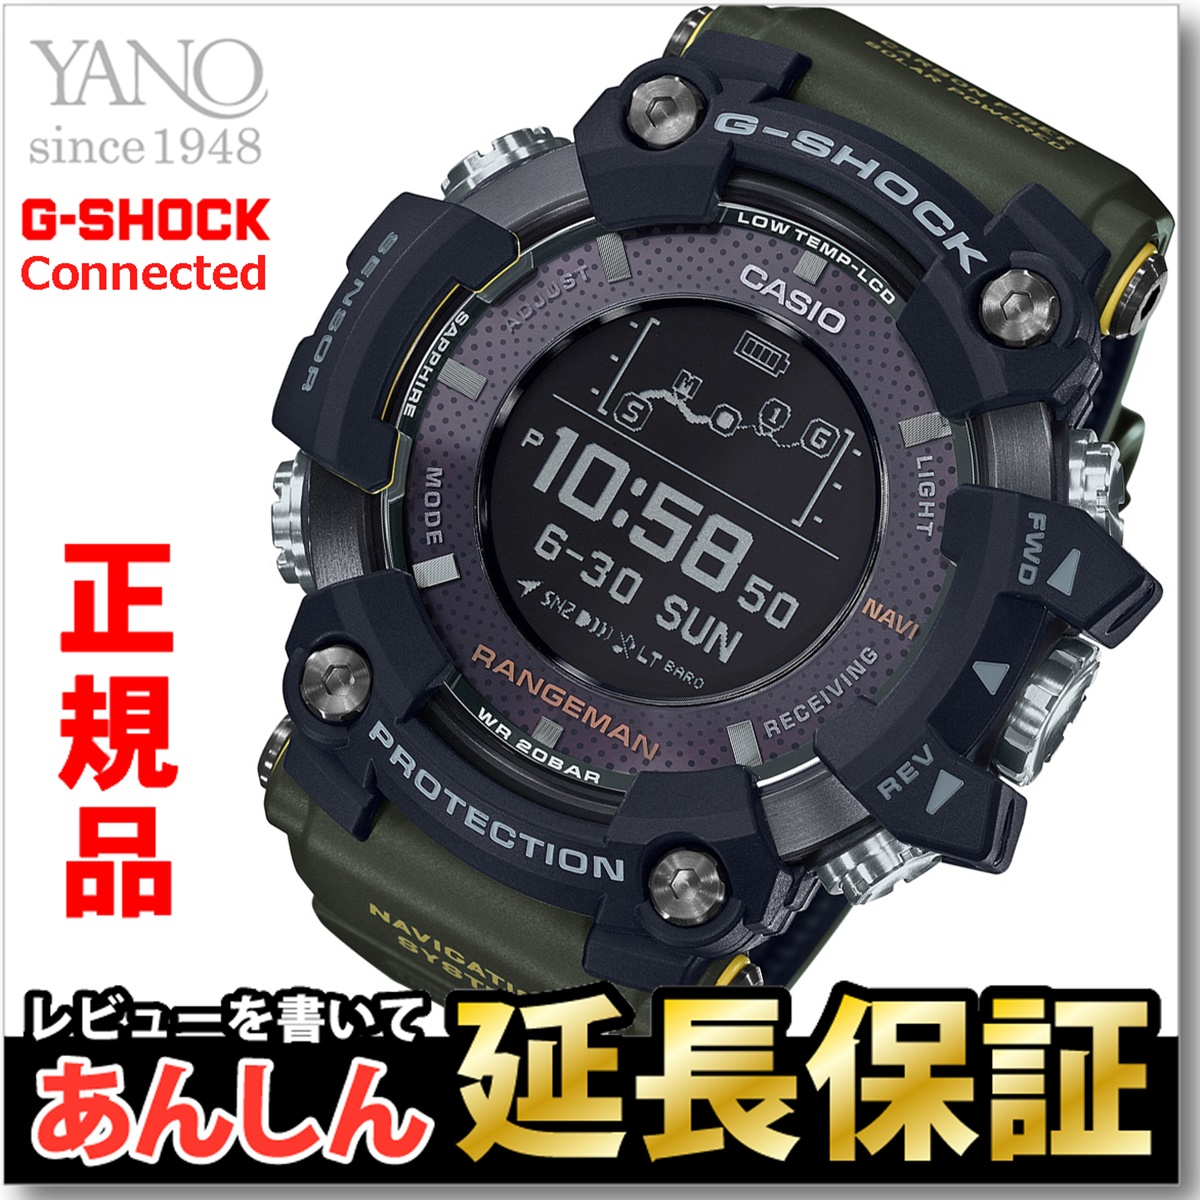 442b95f56 Casio G-Shock GPR-B1000-1BJR survival toughness RANGEMAN solar assist GPS  navigation ...